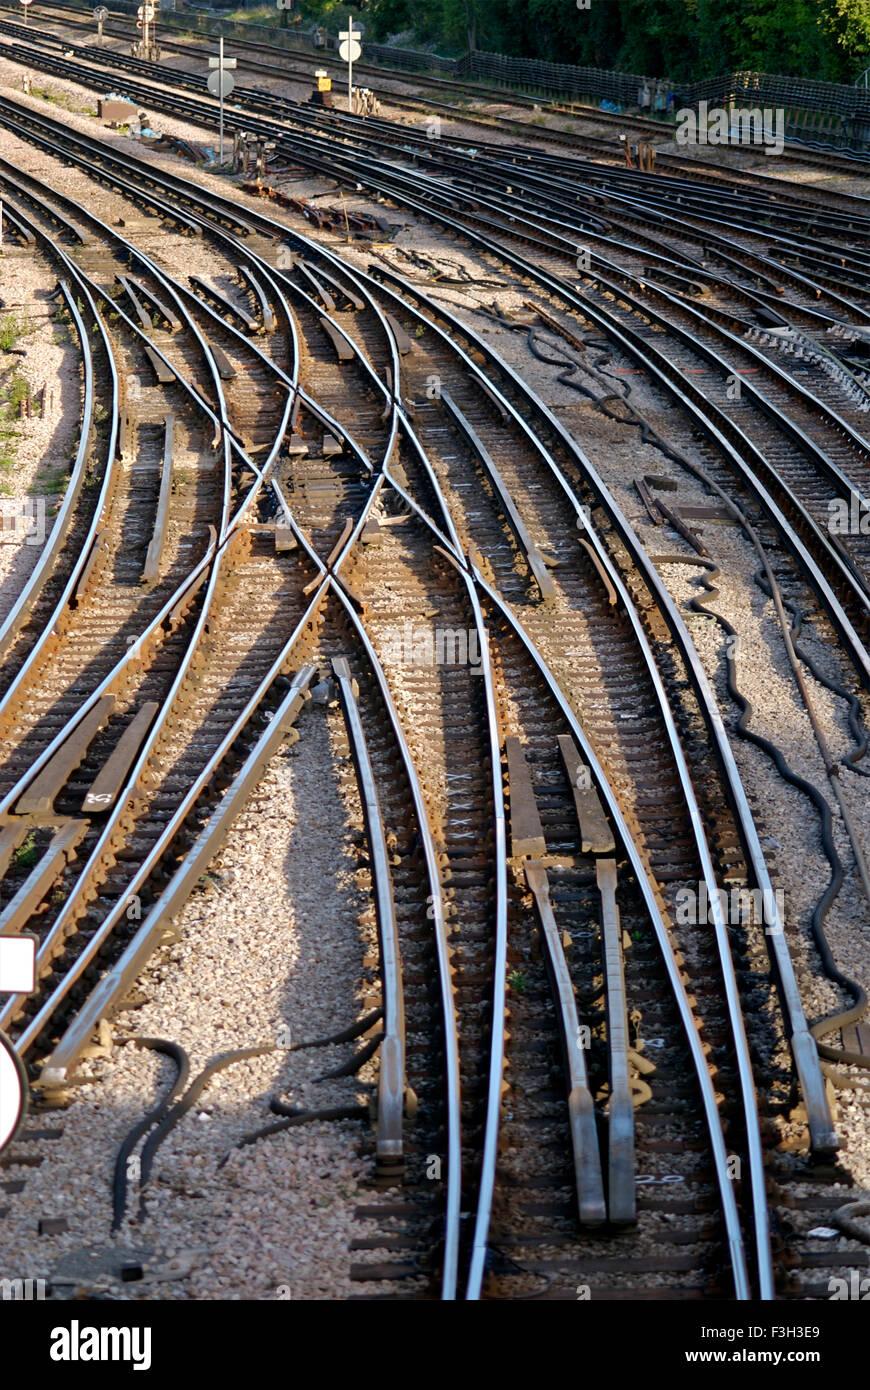 Tube train tracks ; Harrow On The Hill Middlesex London ; U.K. United Kingdom England - Stock Image